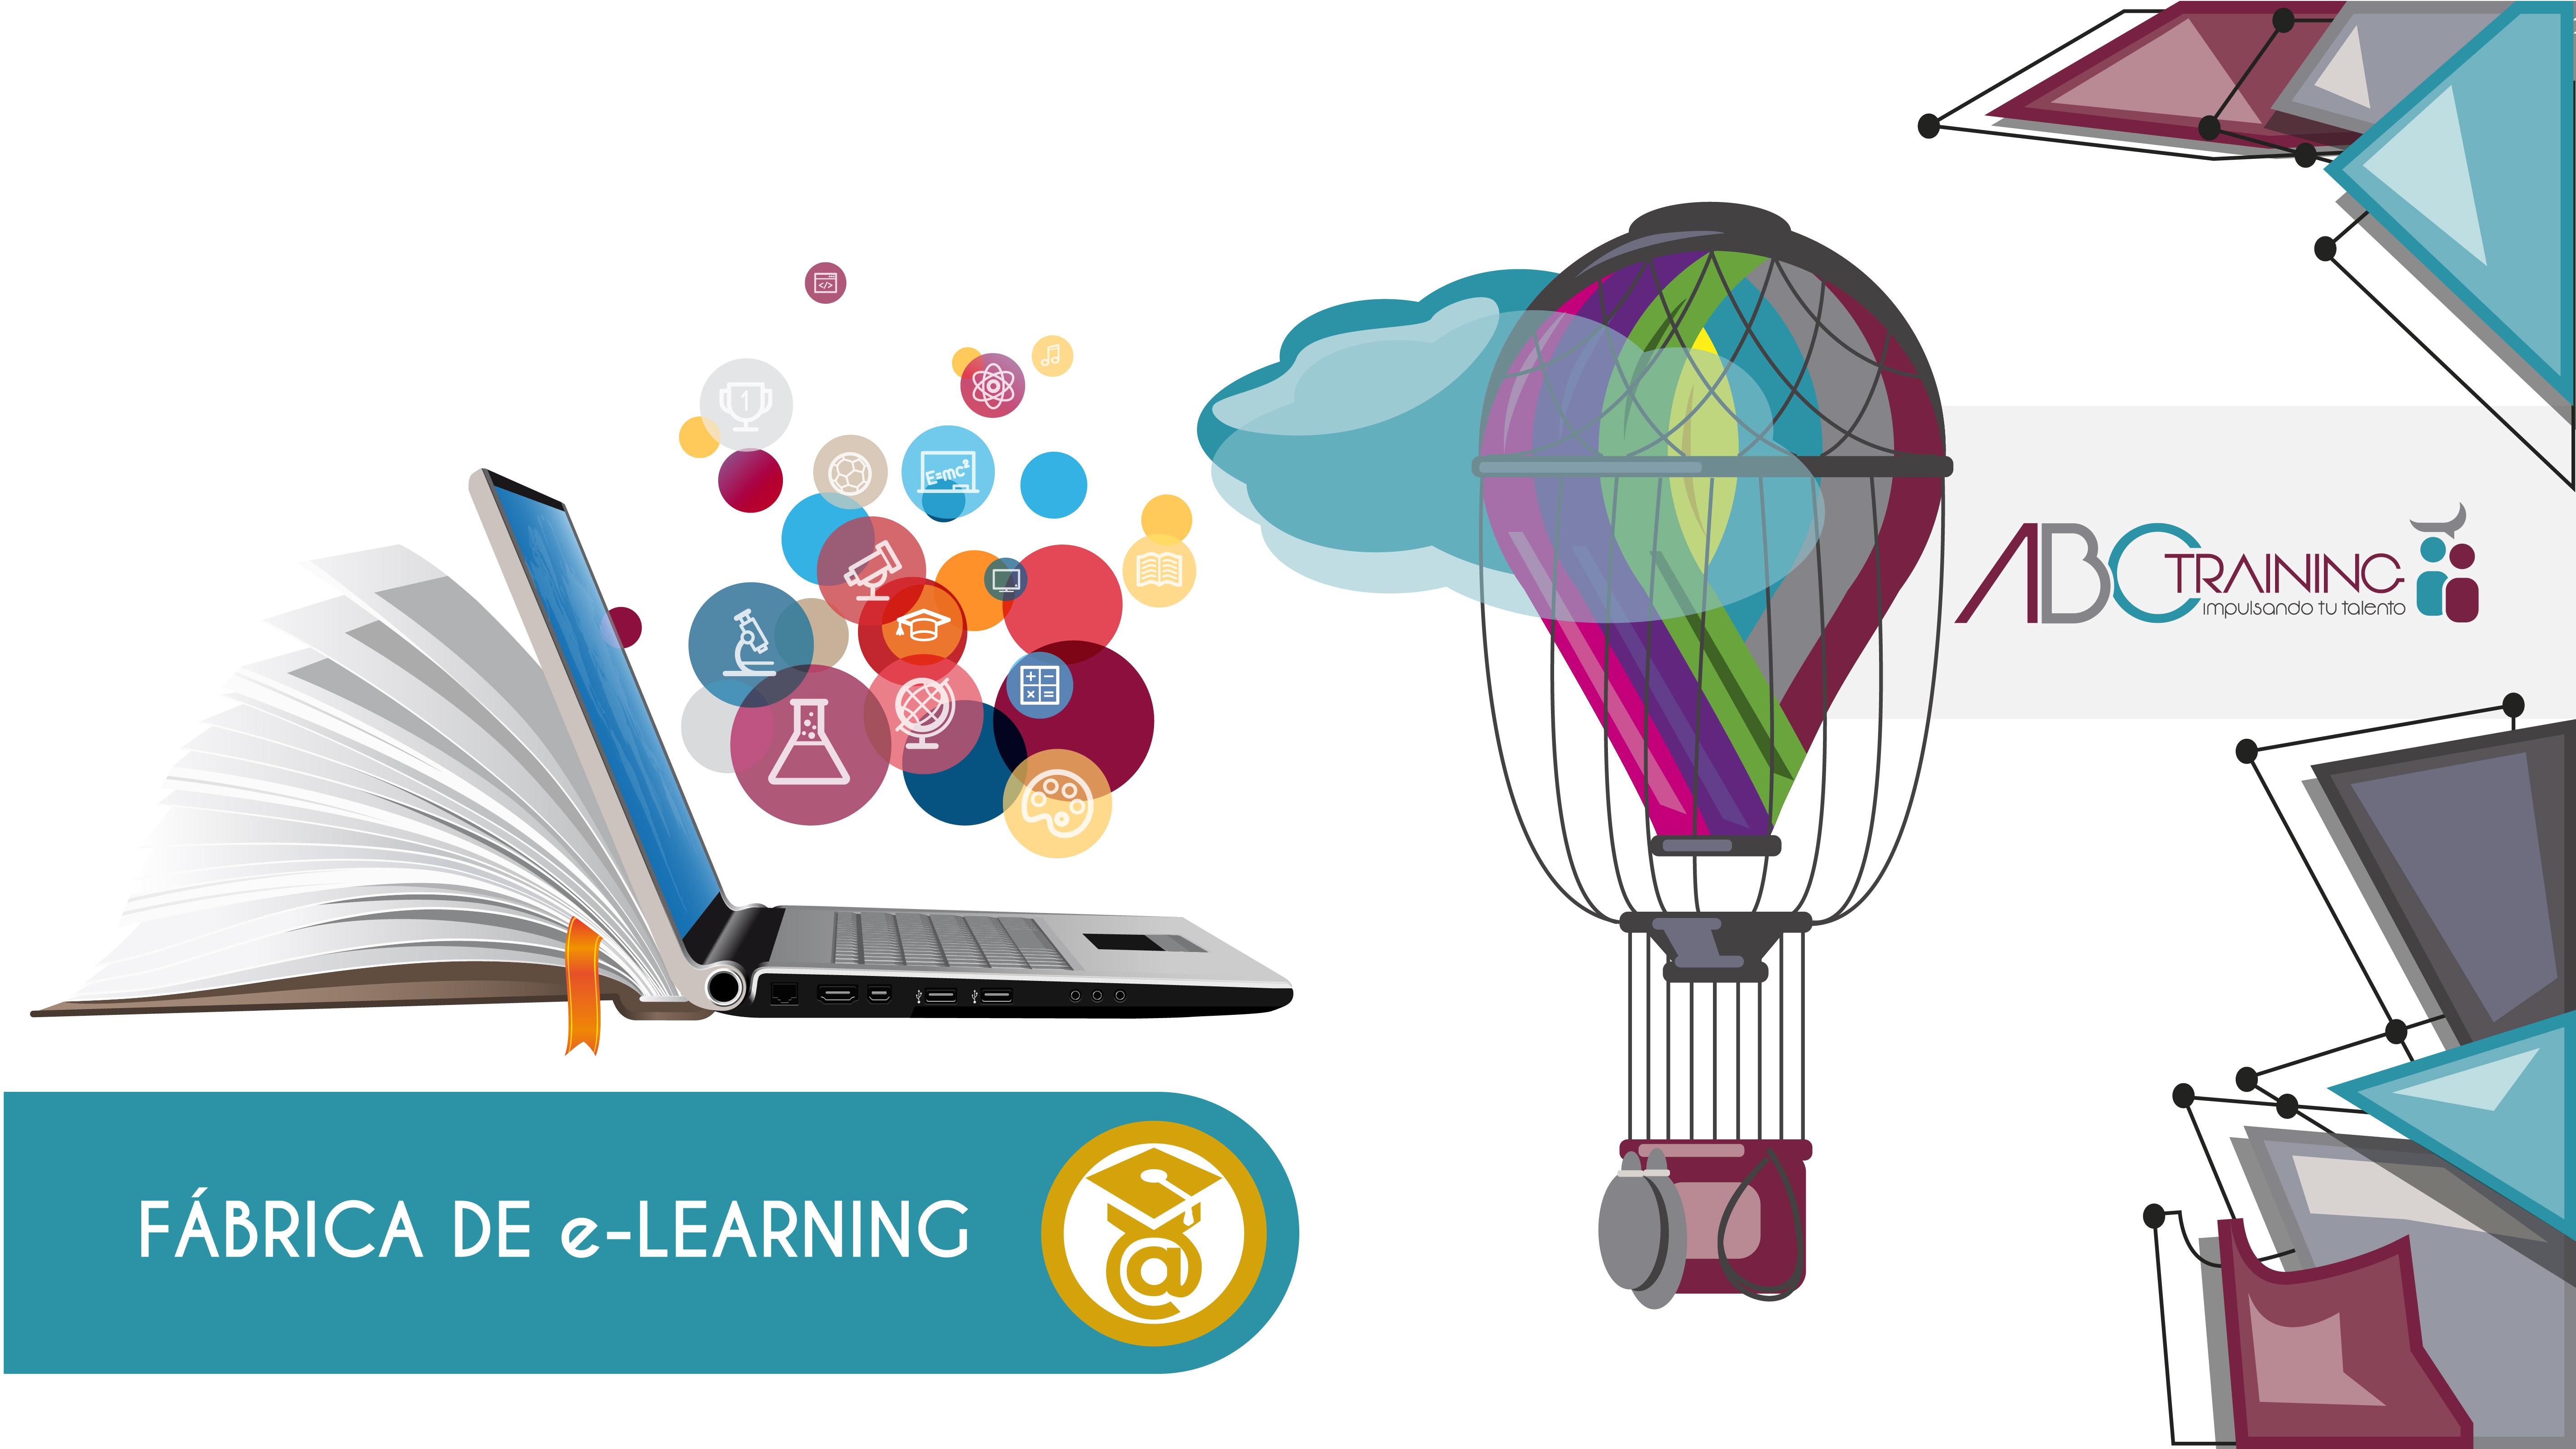 FÁBRICA DE e-LEARNING